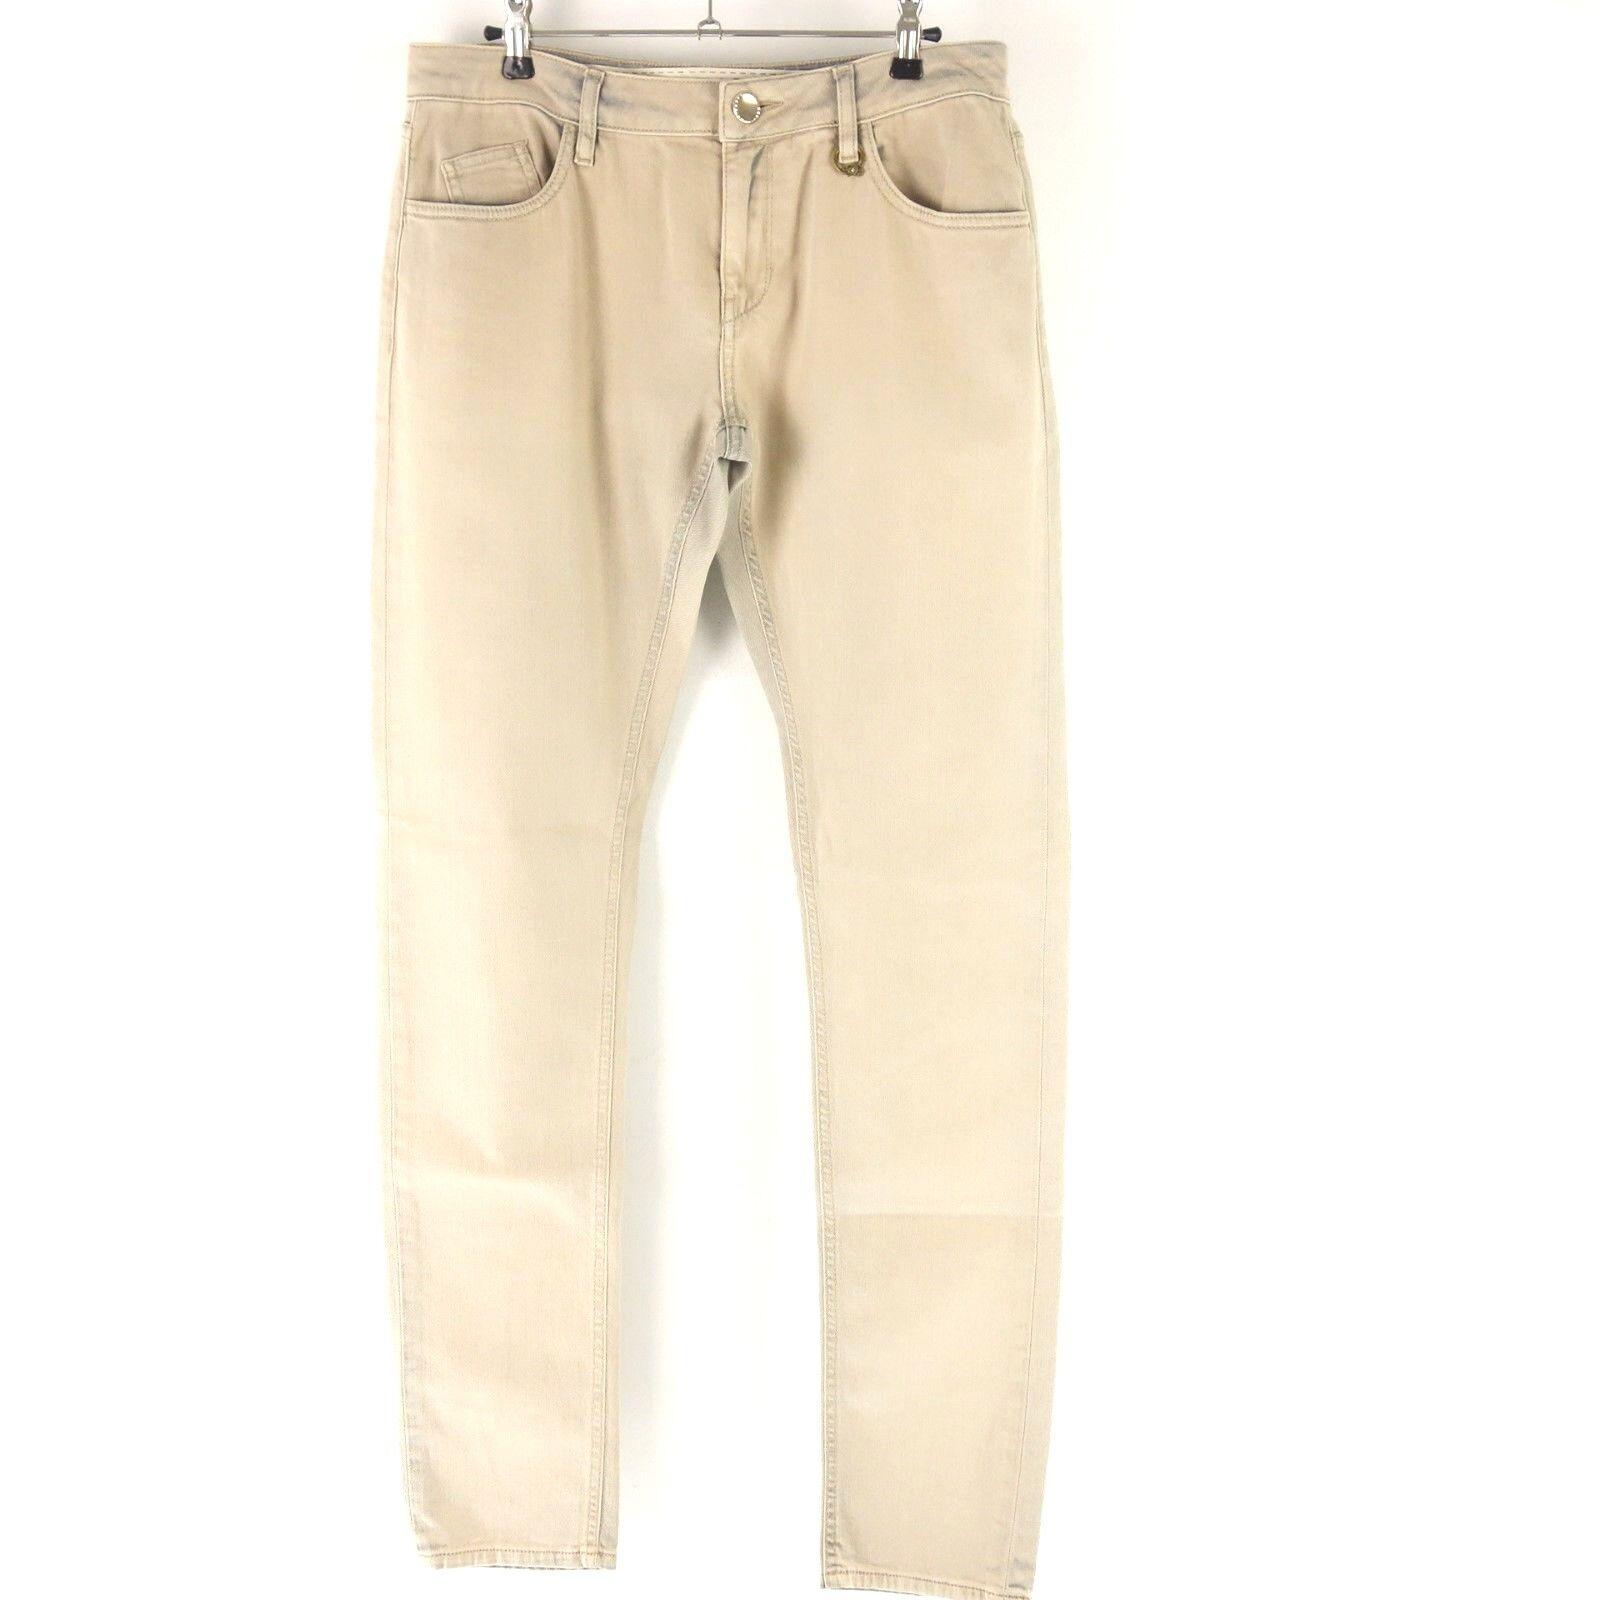 TWIN SET SIMONA BARBIERI Damen Jeans Hose Colourot Straight Gr W31 NP 149 NEU